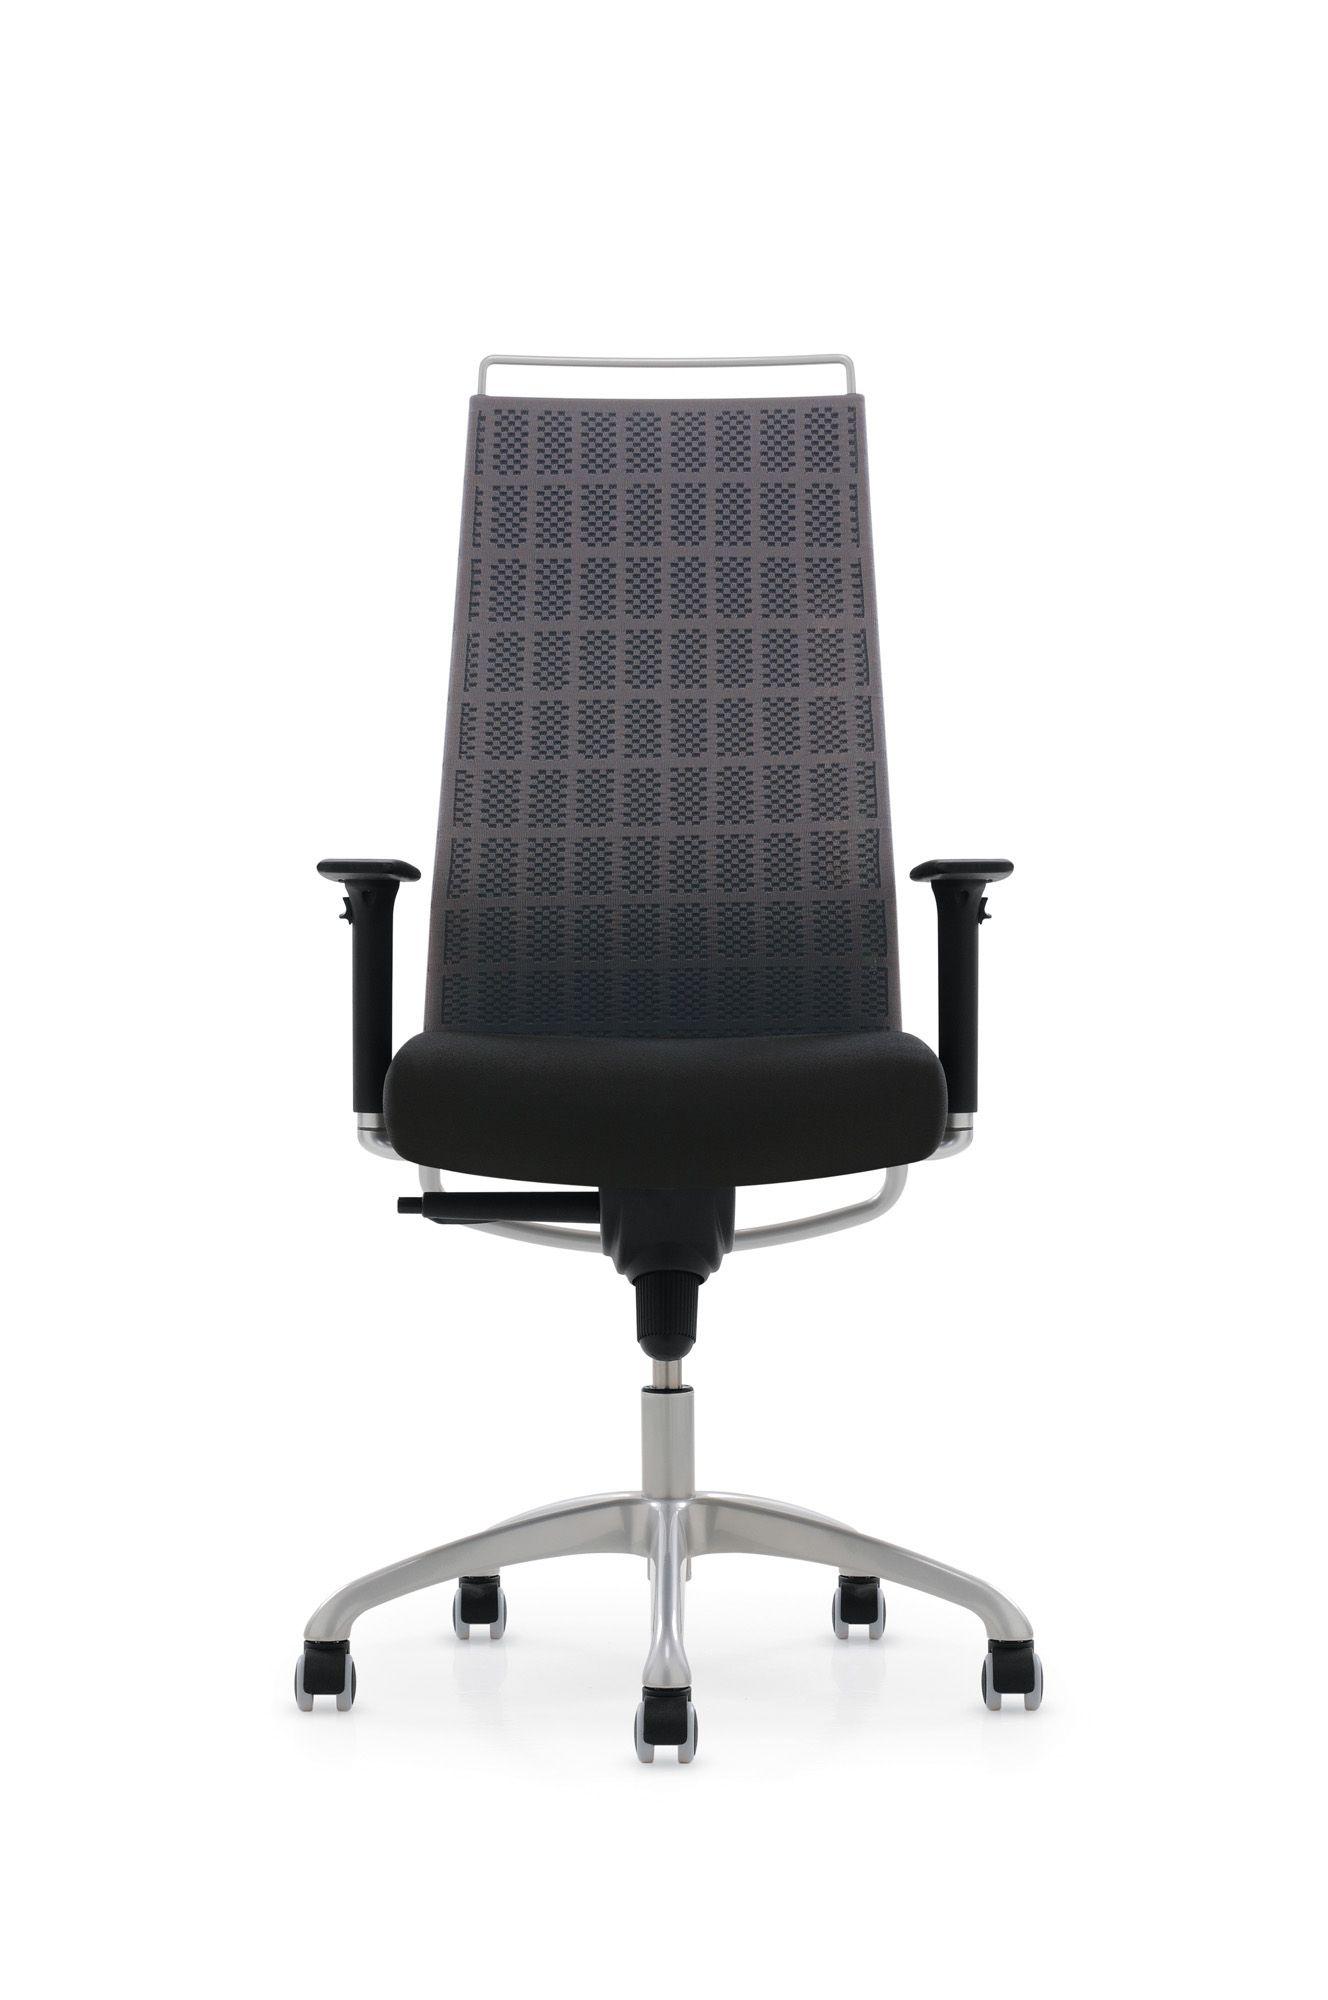 teknion visio chair Executive & Task Seating